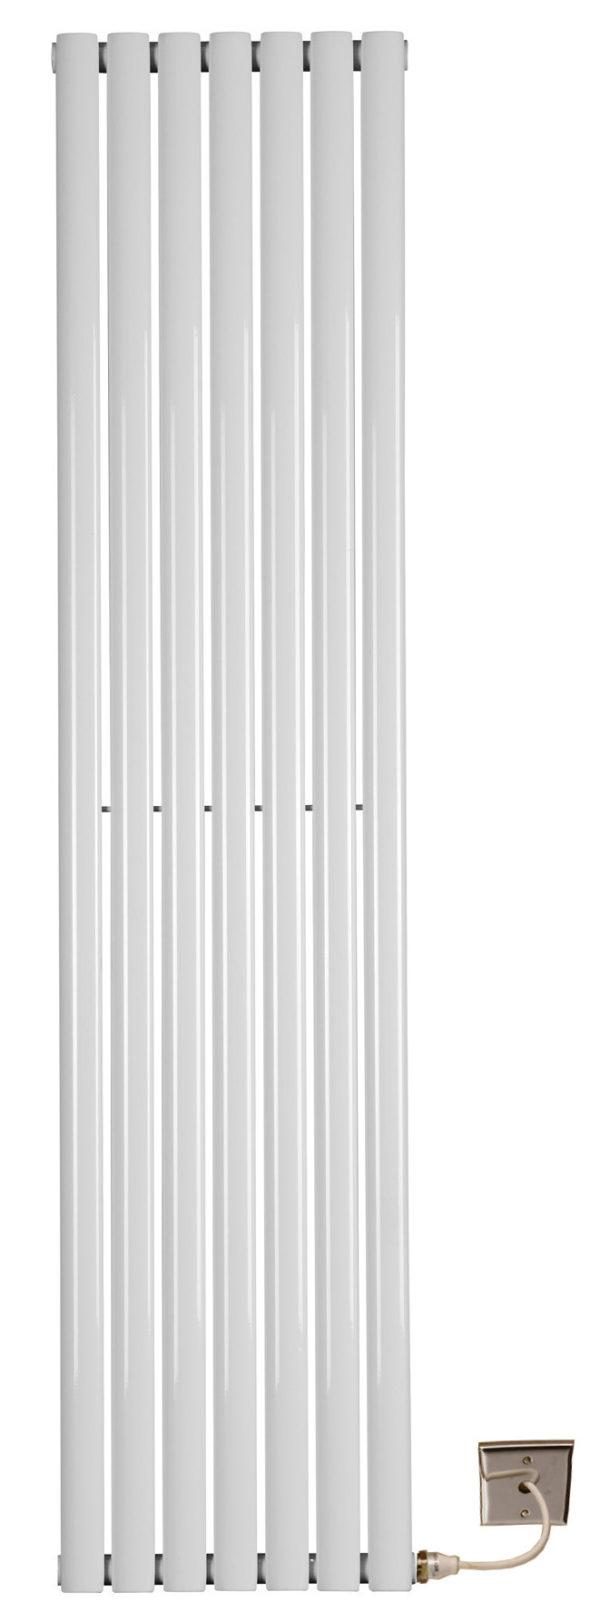 Electric oval radiators